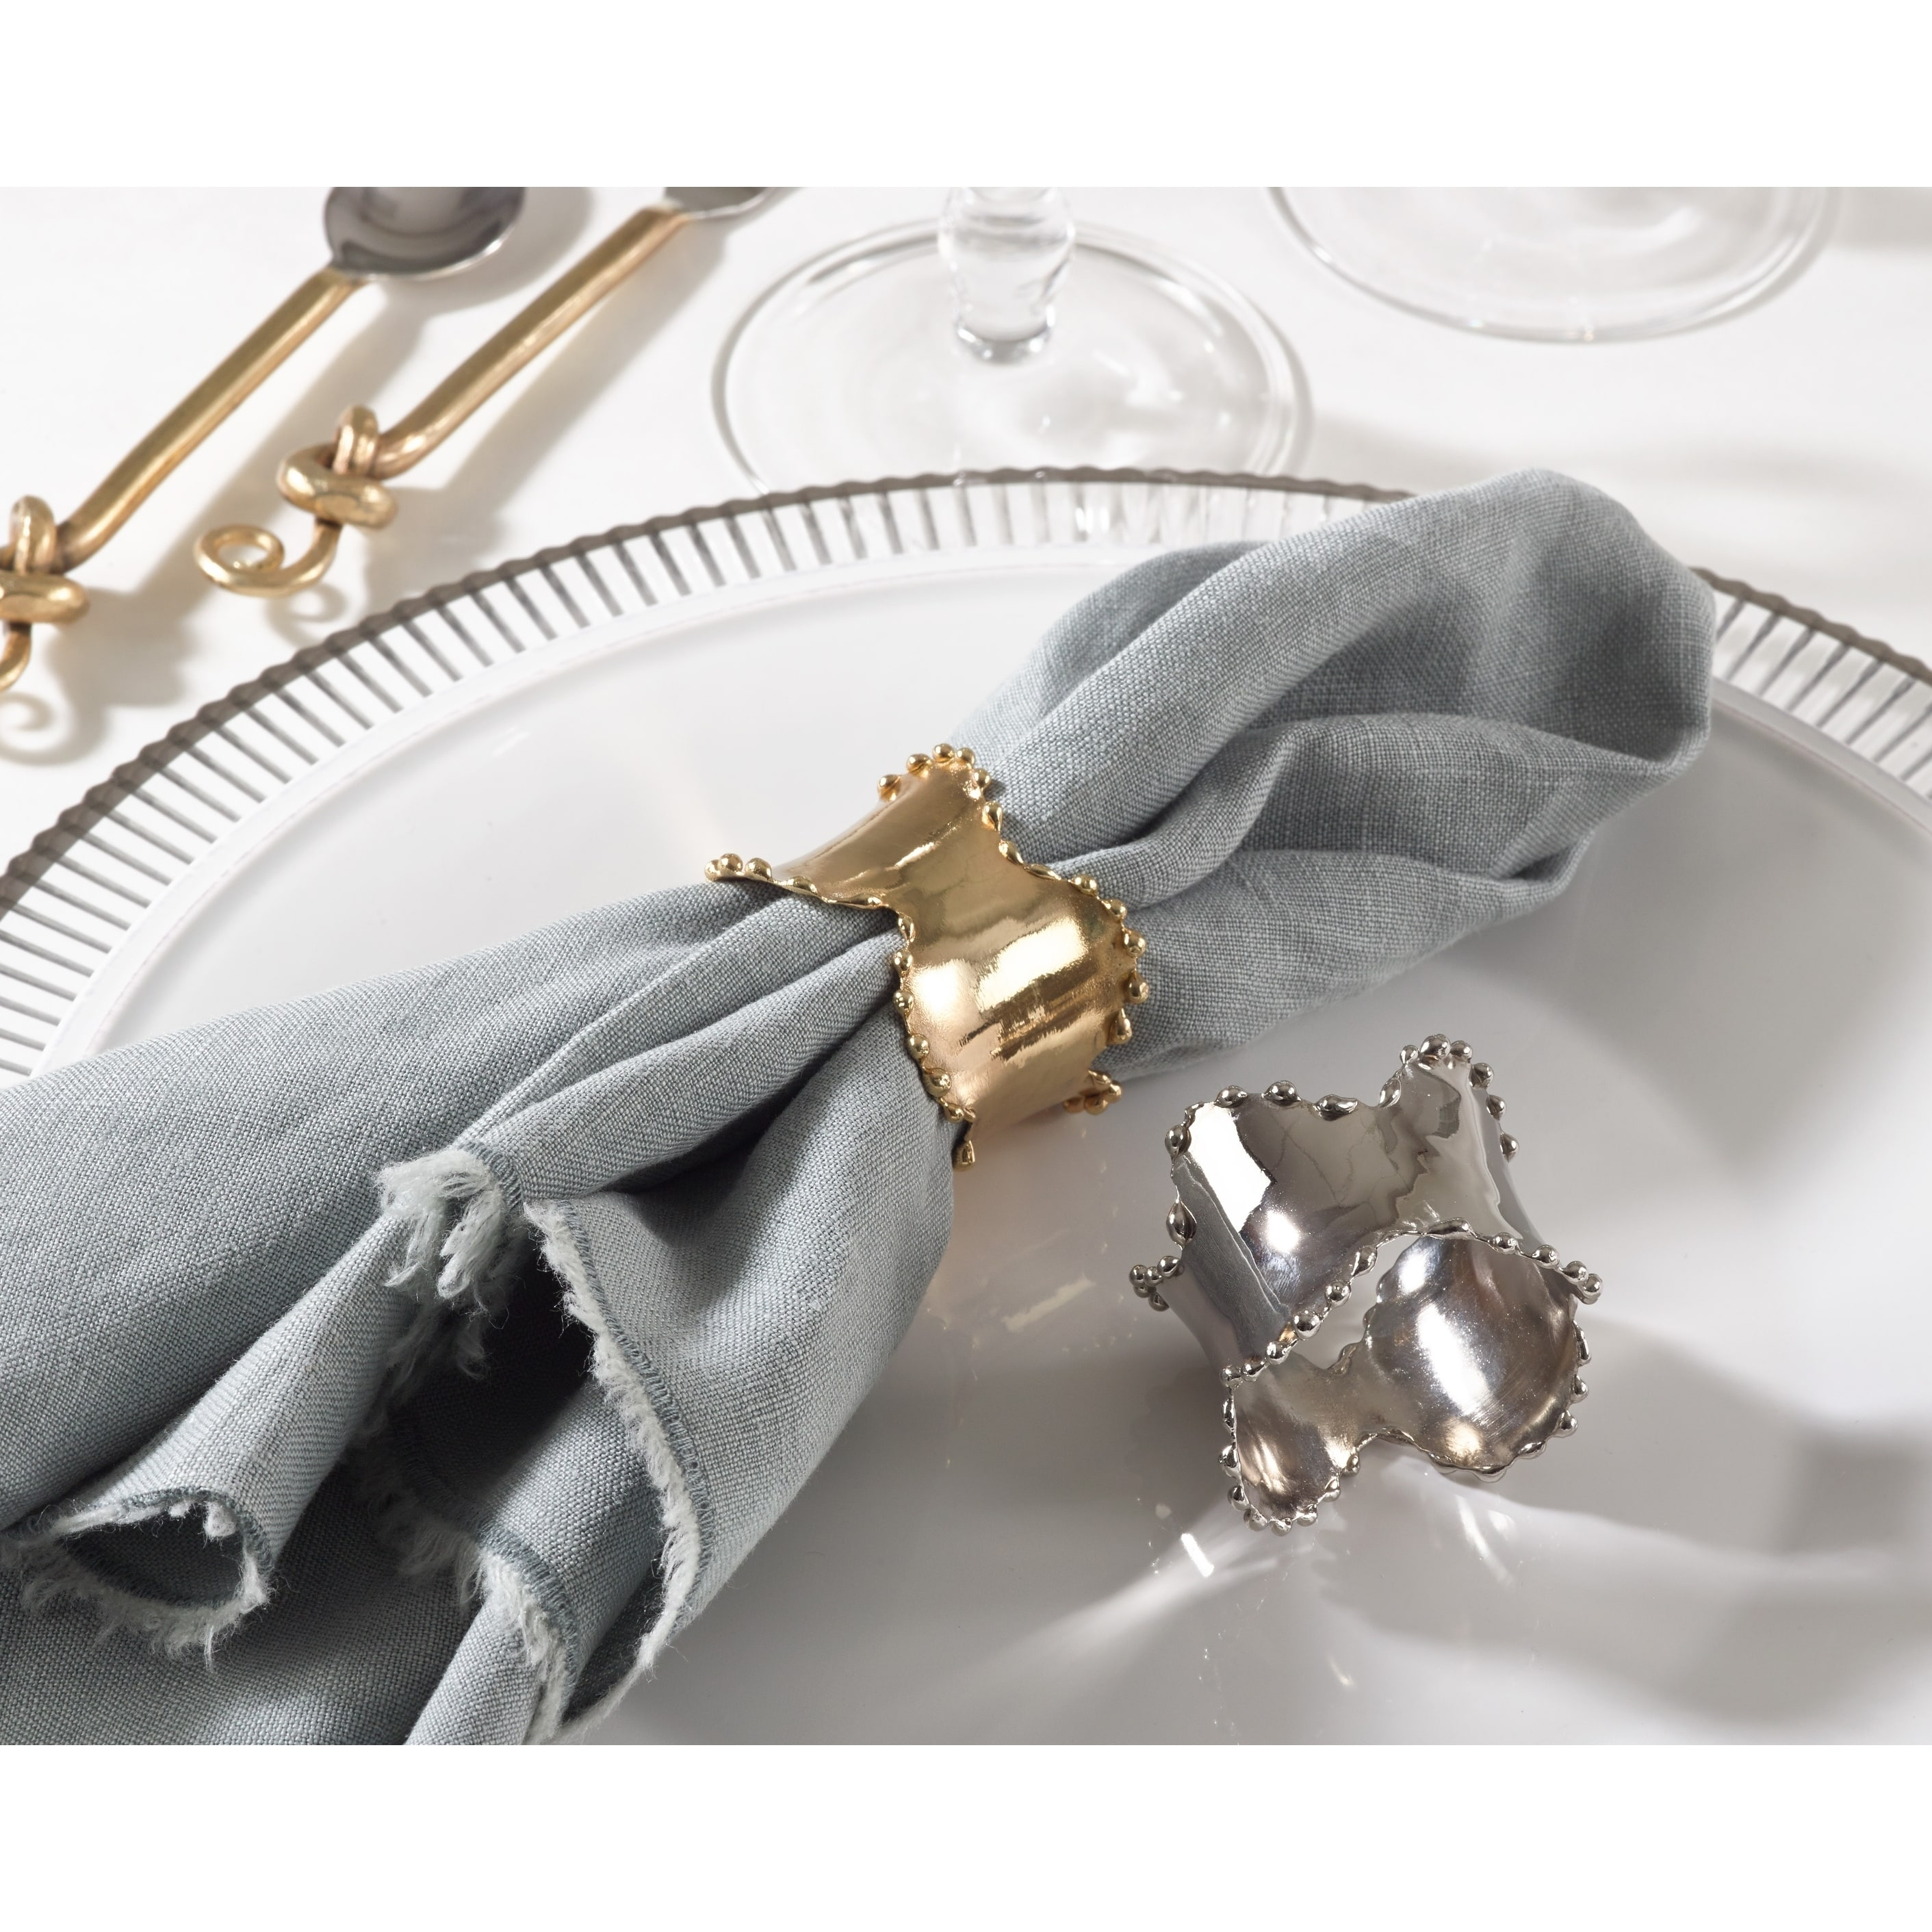 Napkin Rings Handmade Products Set Of 4 Napkin Rings Purple Flower Rustic Napkin Rings Modern Napkin Holders